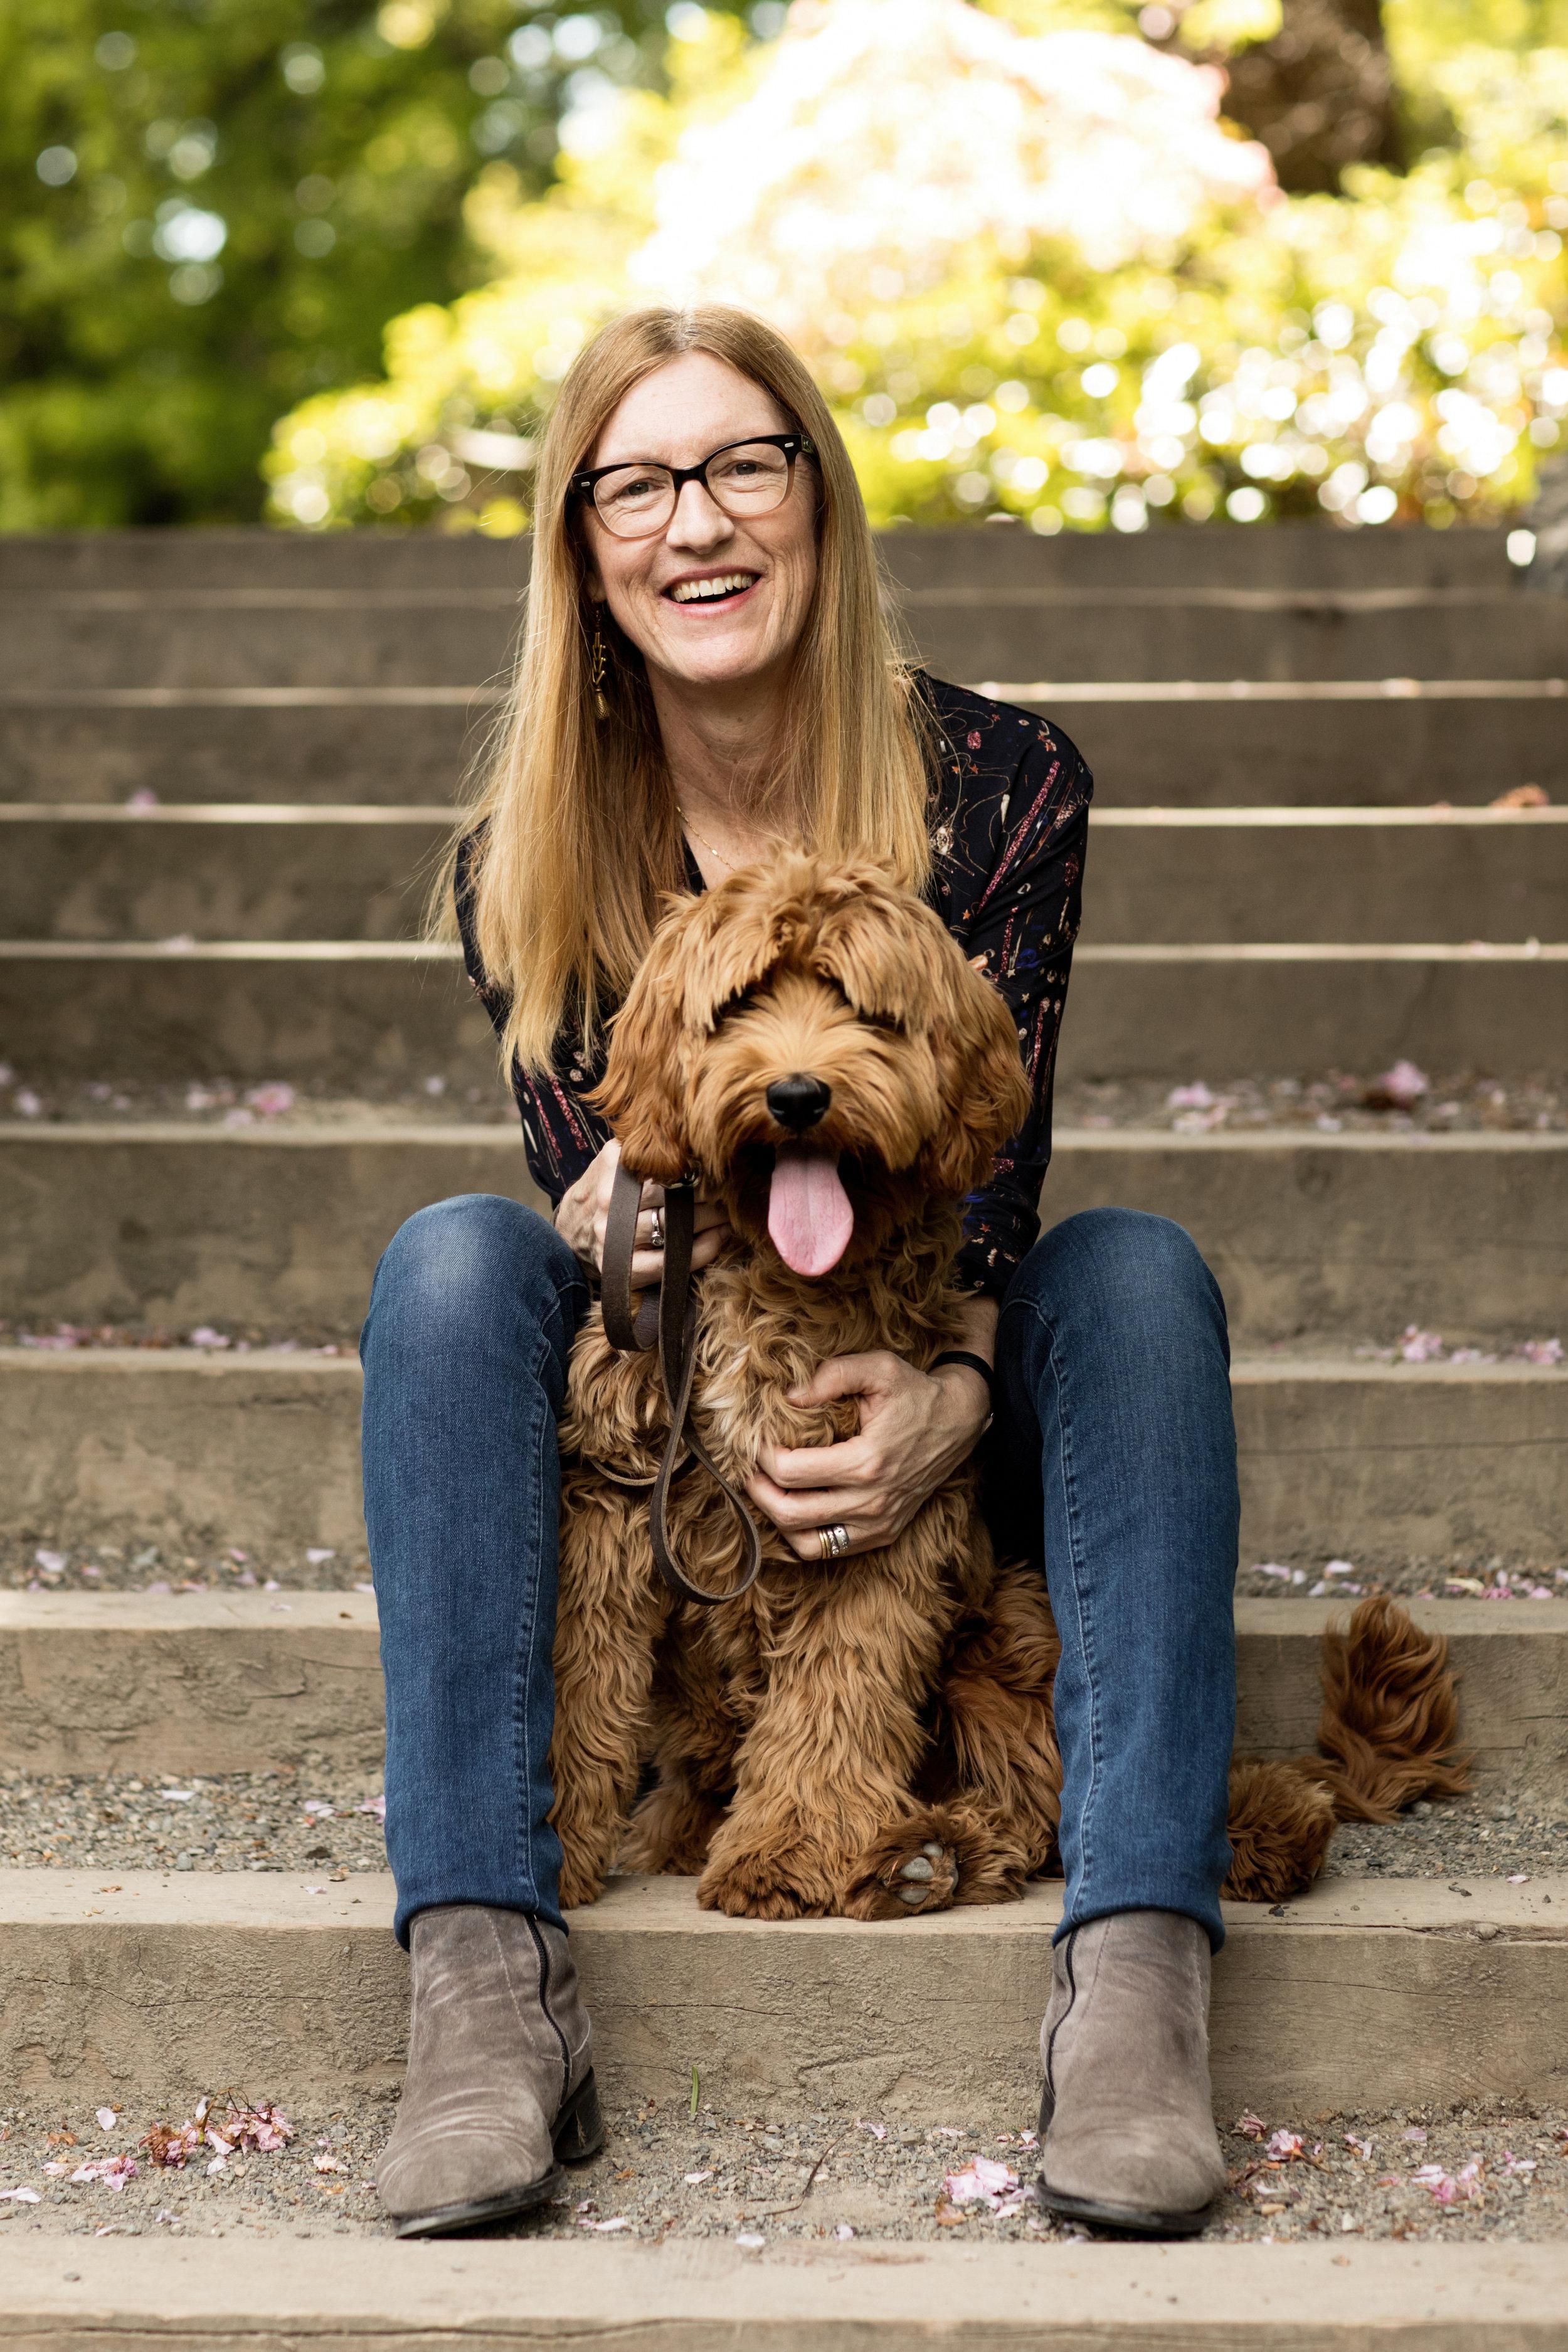 045_Anne with puppy Compass_Lifestyle_April2019_by_Jenny-Jimenezez.jpg